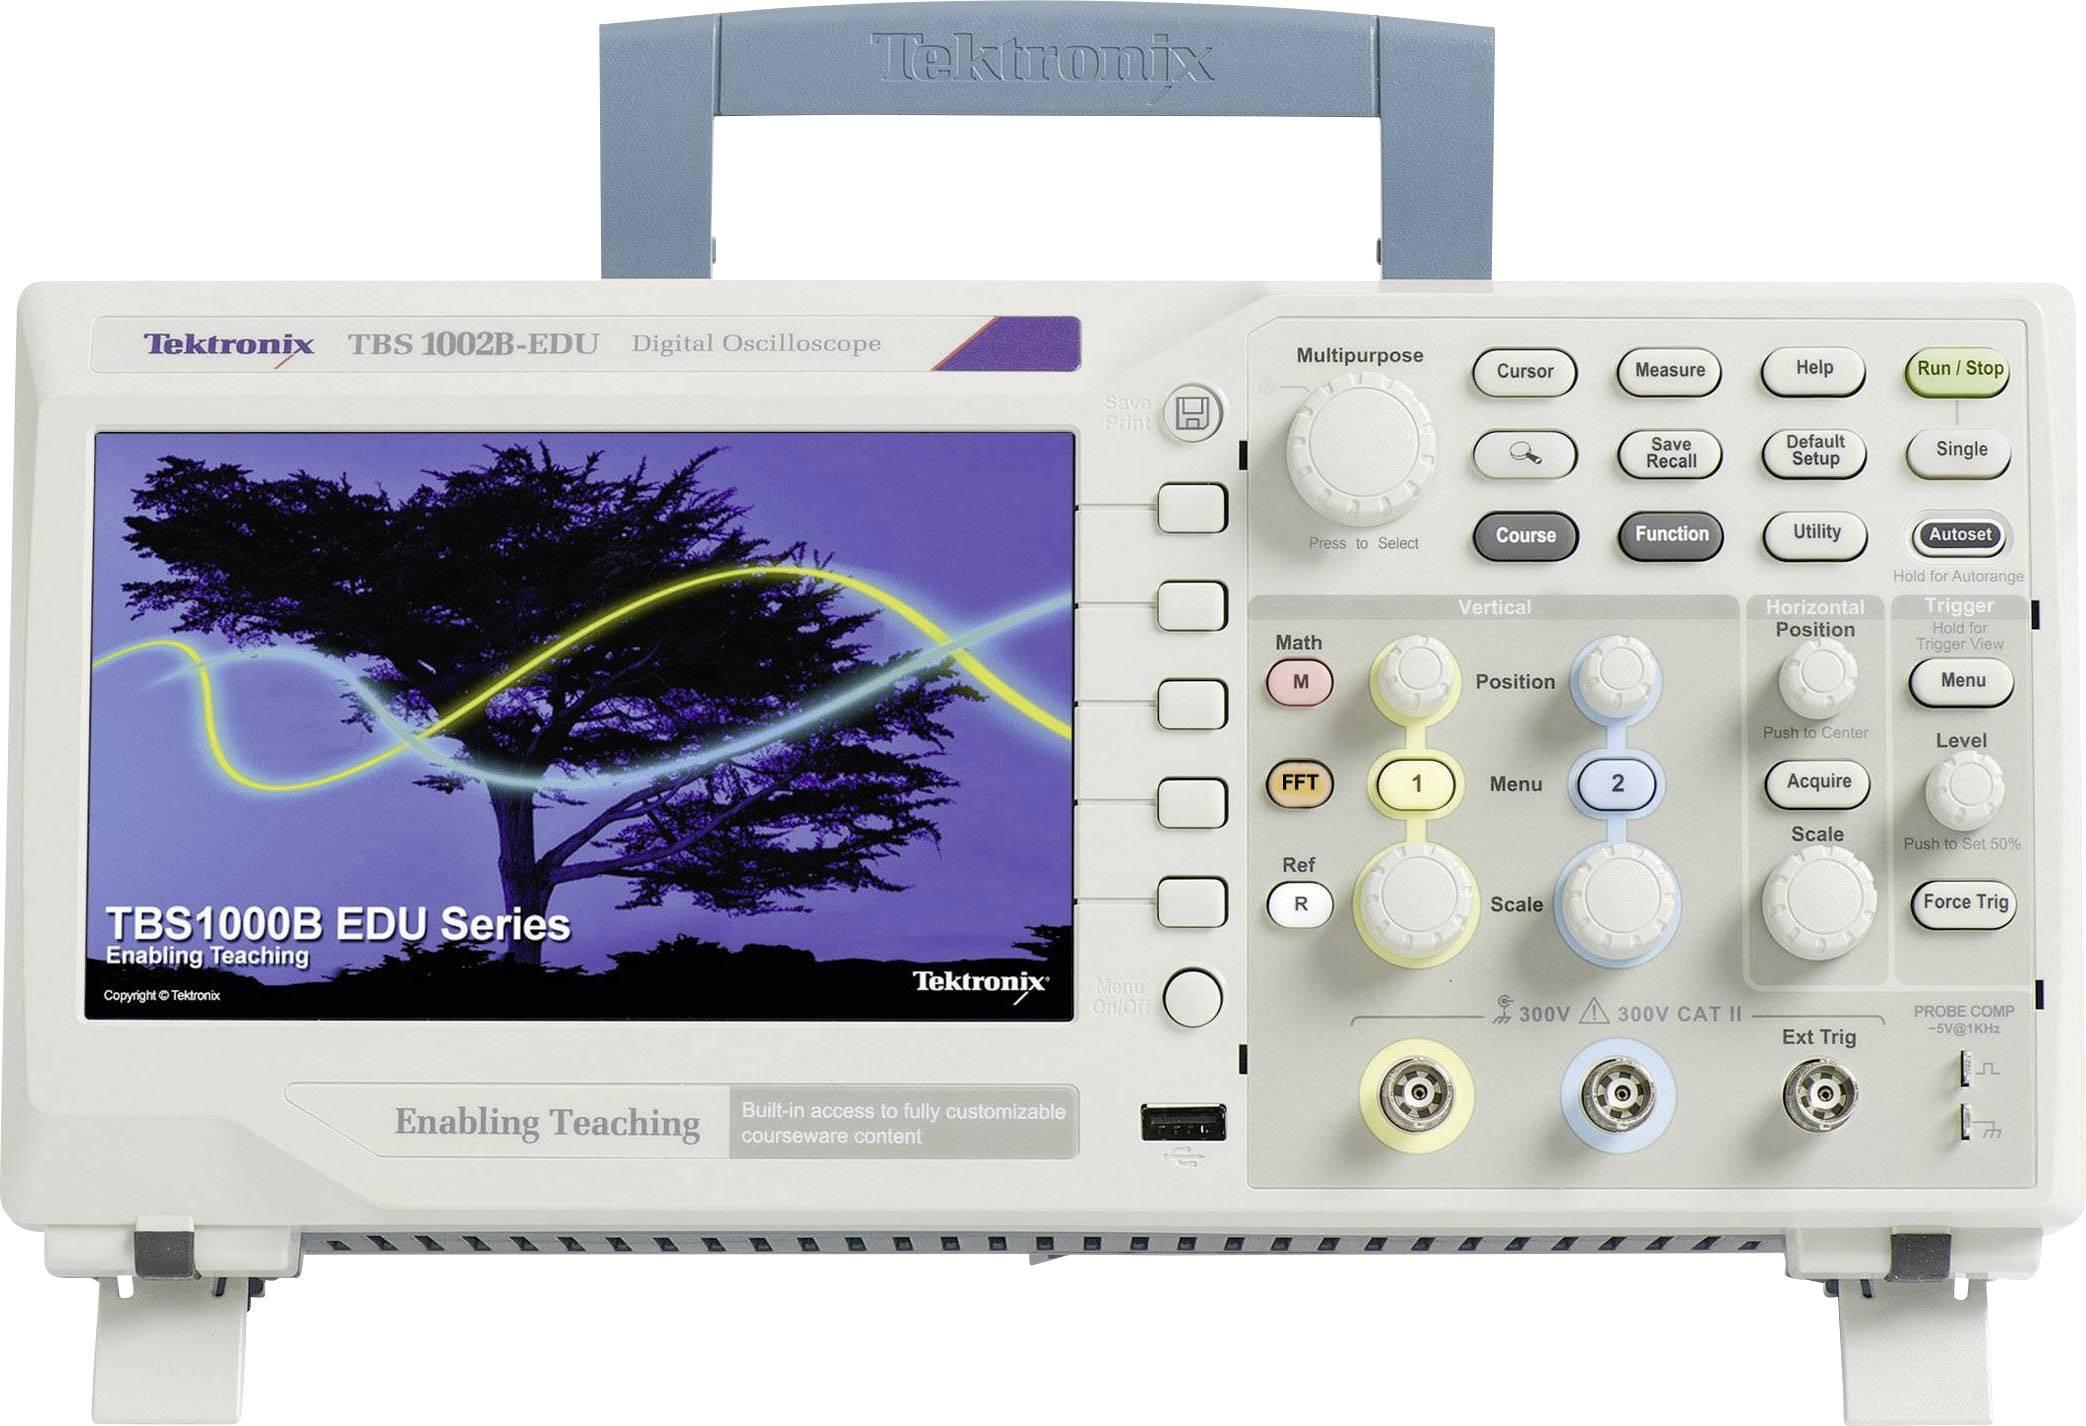 Digitálny osciloskop Tektronix TBS1102B-EDU, 100 MHz, 2-kanálový, kalibrácia podľa ISO